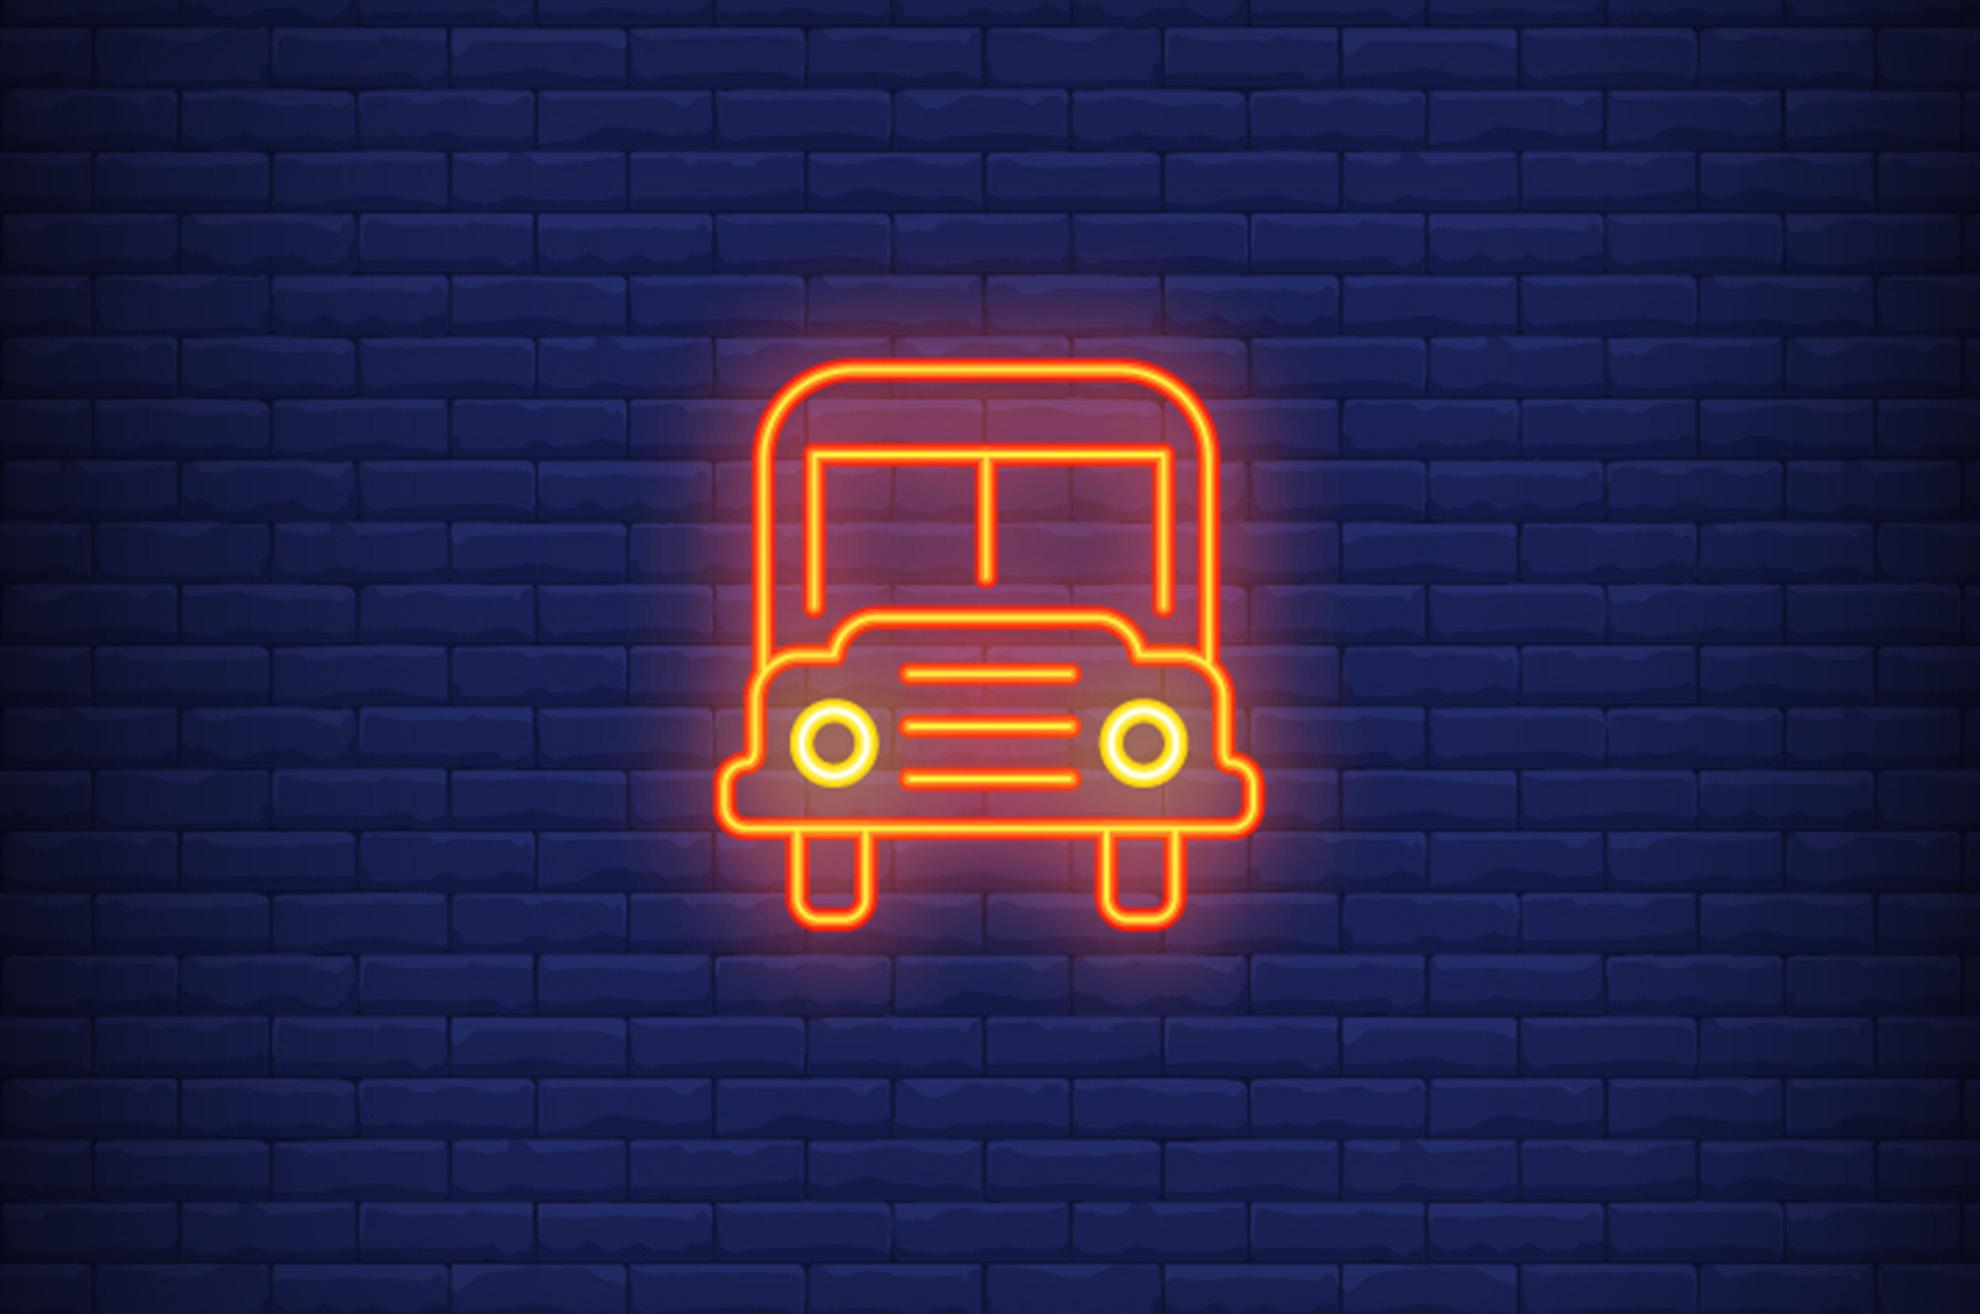 "<img src=""https://komisja-autobusowa.igkm.pl/wp-content/uploads/2018/02/LOGO_res.png""><br>Komisja Taboru Autobusowego IGKM"